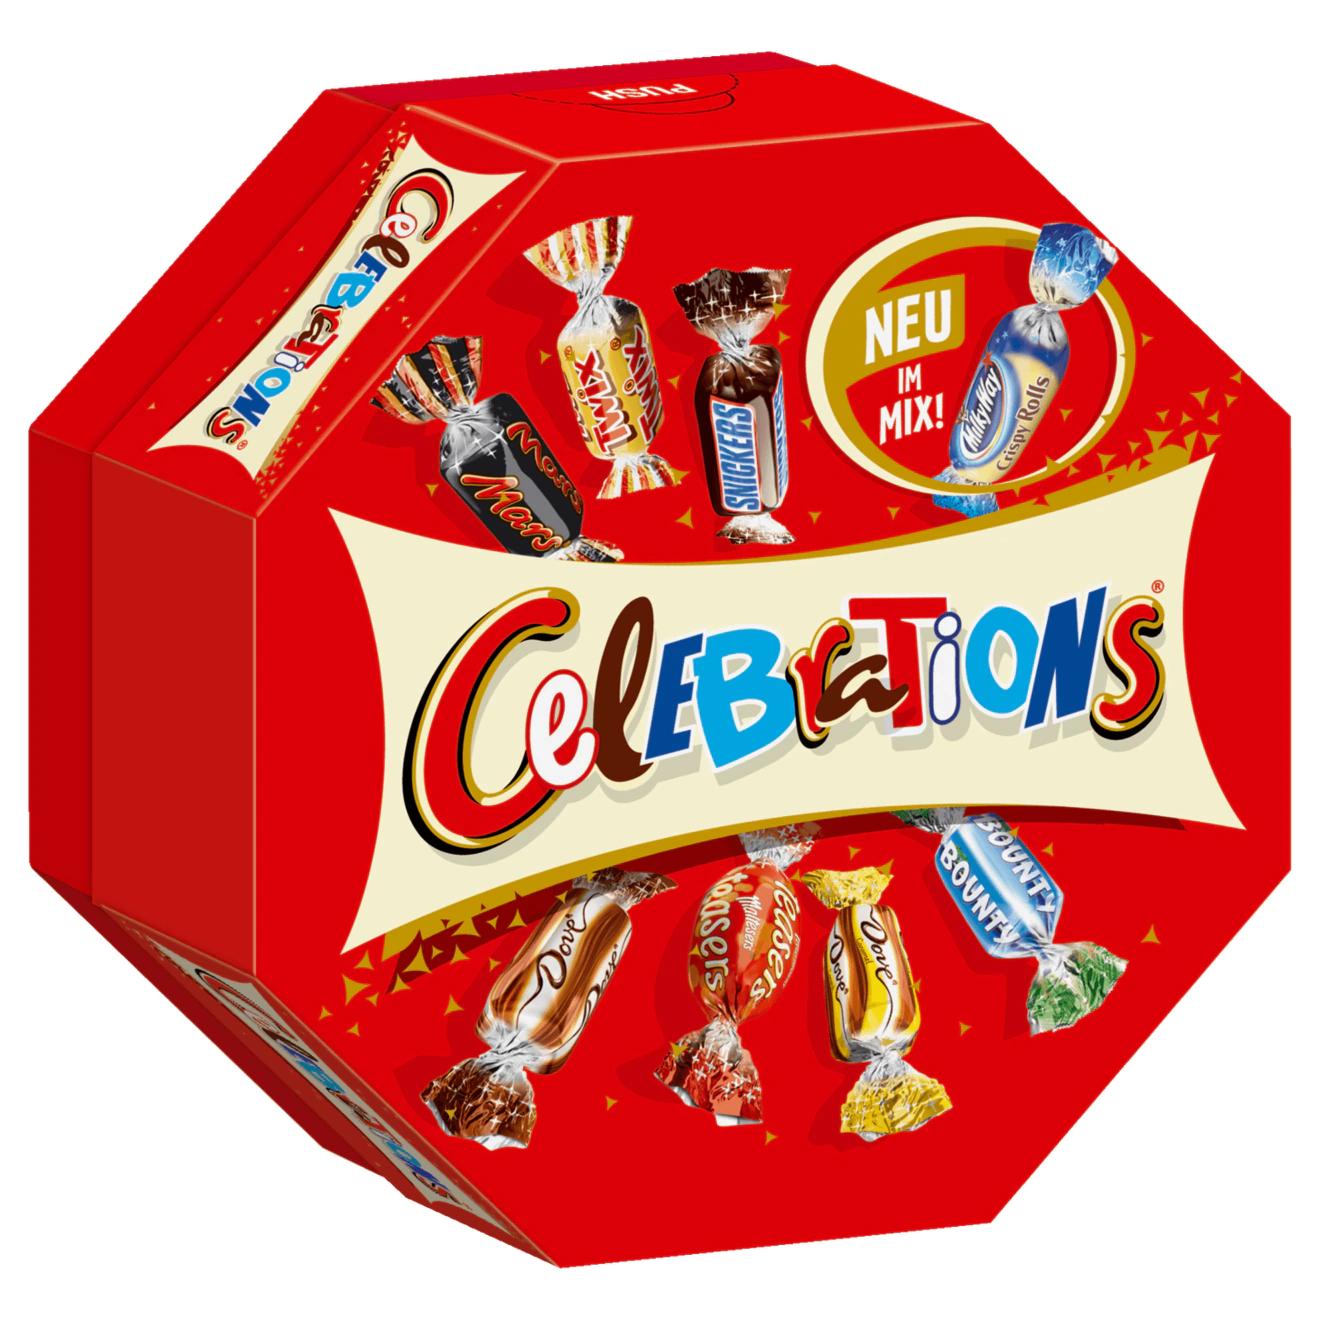 Celebrations 186g & Amicelli für 1,69€ mit 10% Coupon [ab 02.12. Rossmann]